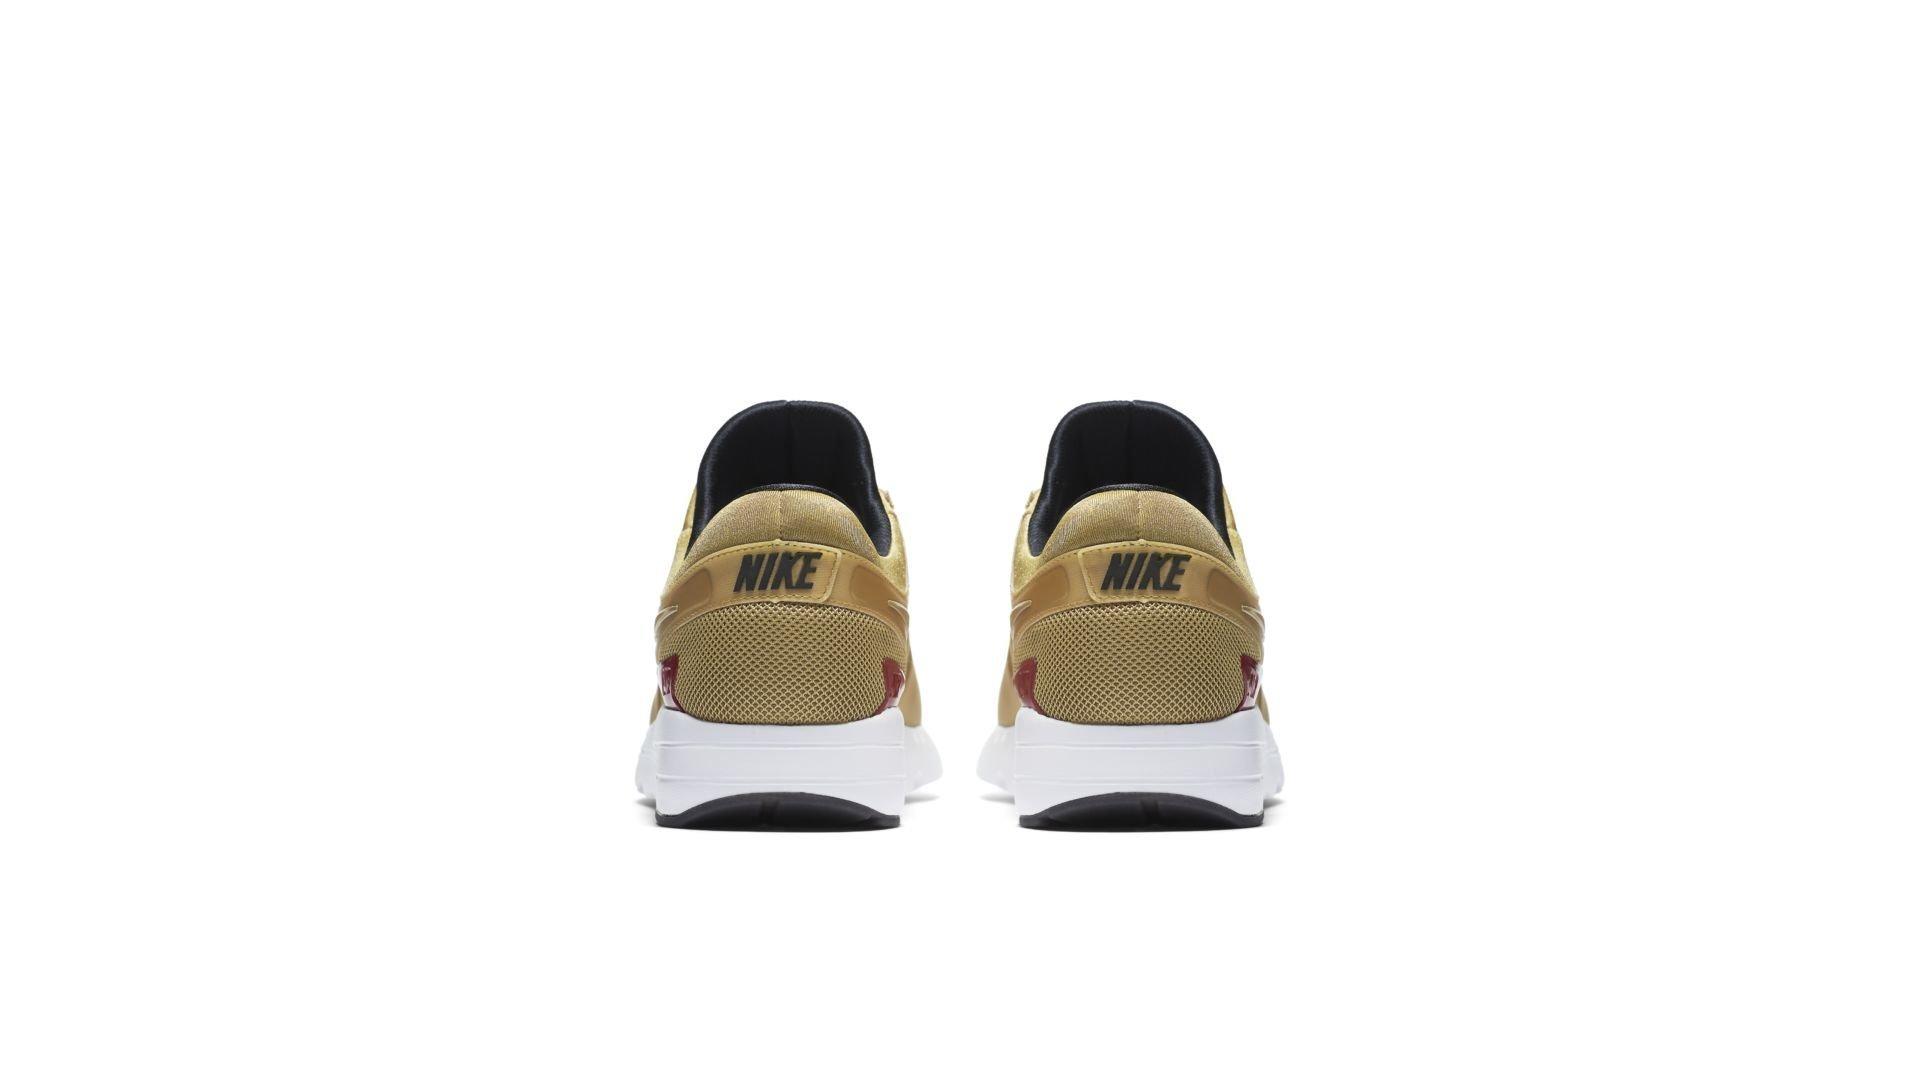 Nike Air Max Zero 'Metallic Gold' (789695-700)